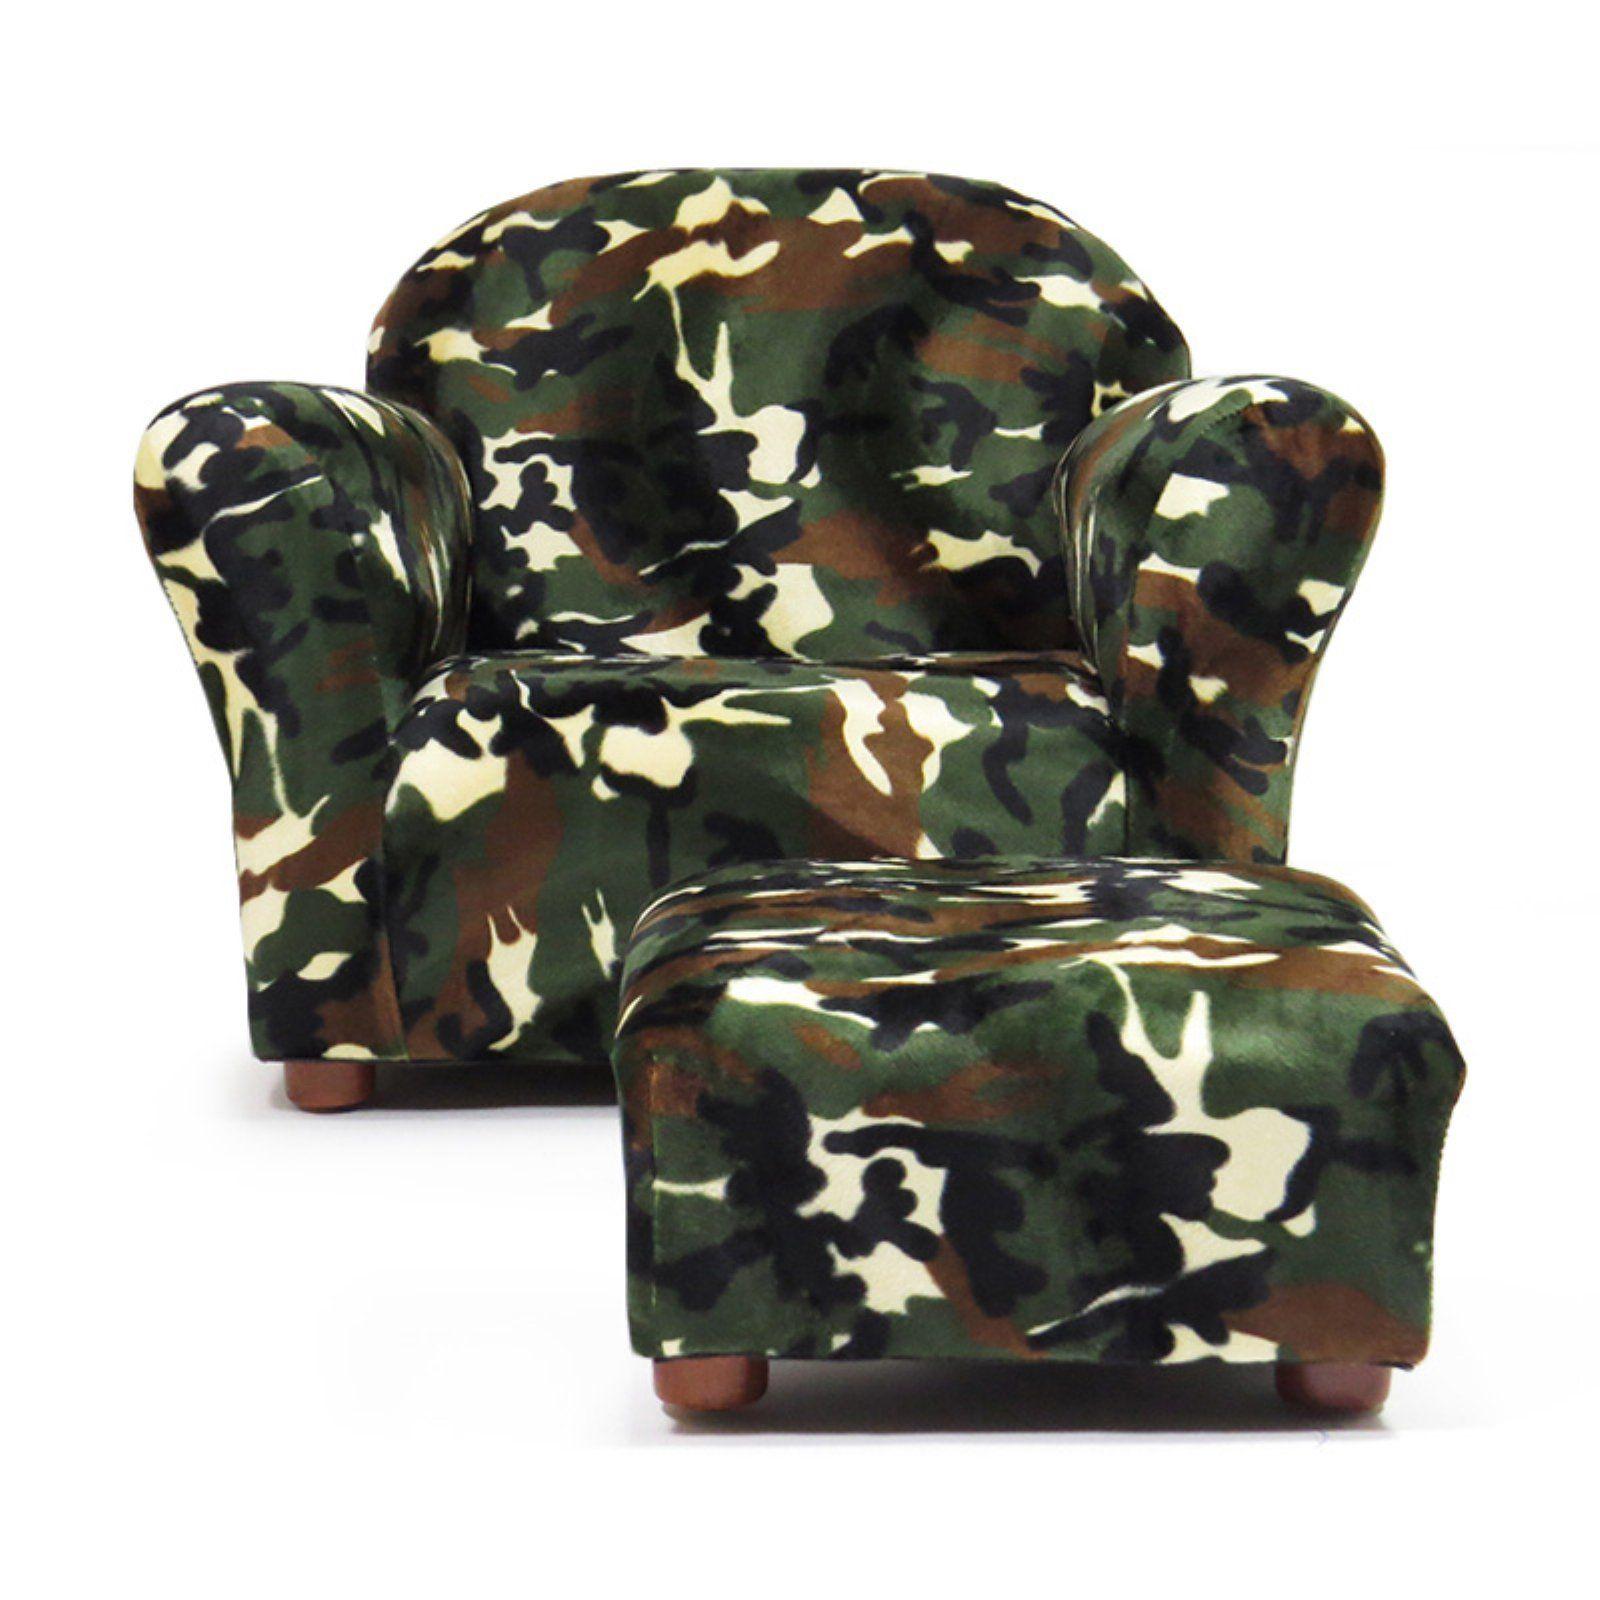 Keet Roundy Kids Chair Camo With Ottoman Club Chairs Bean Bag